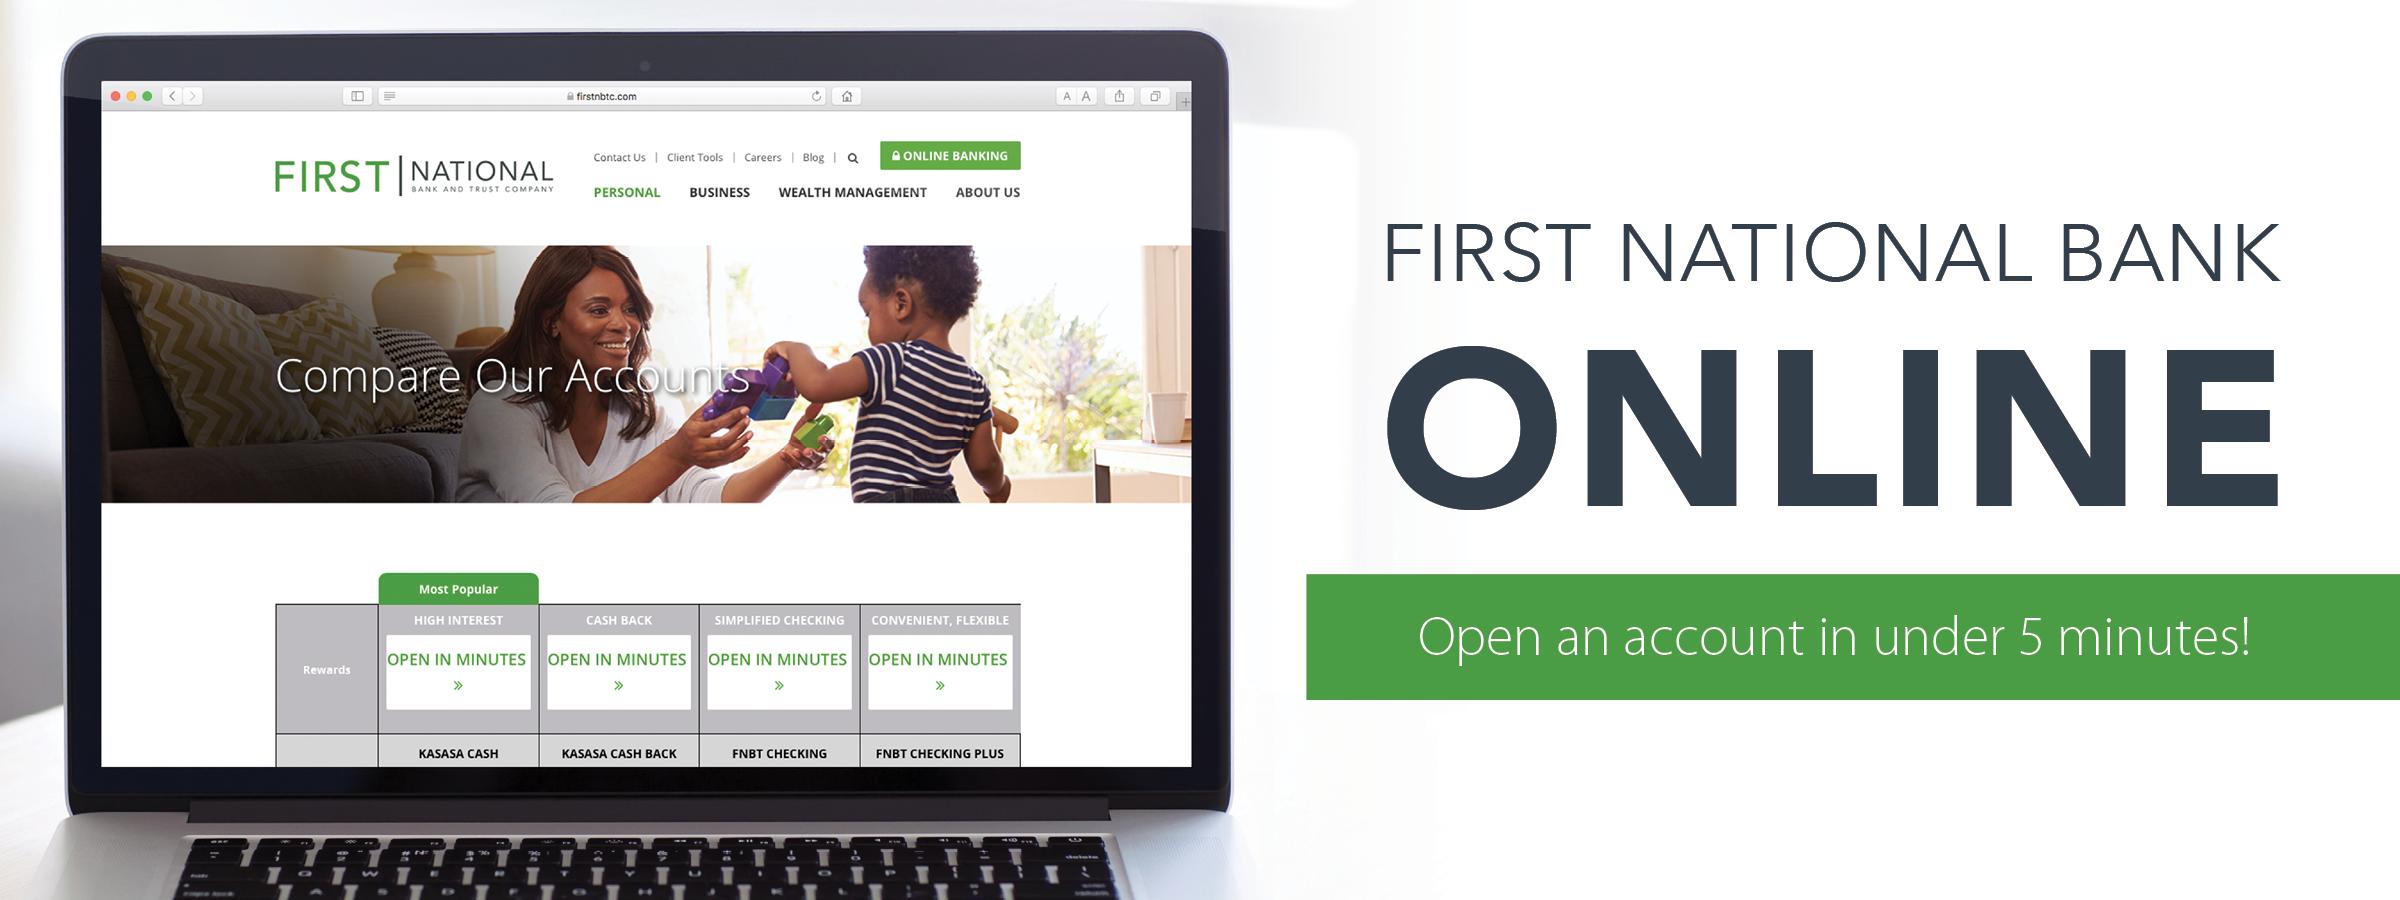 FNBT_OnlineAccountOpening_Website_2018.png